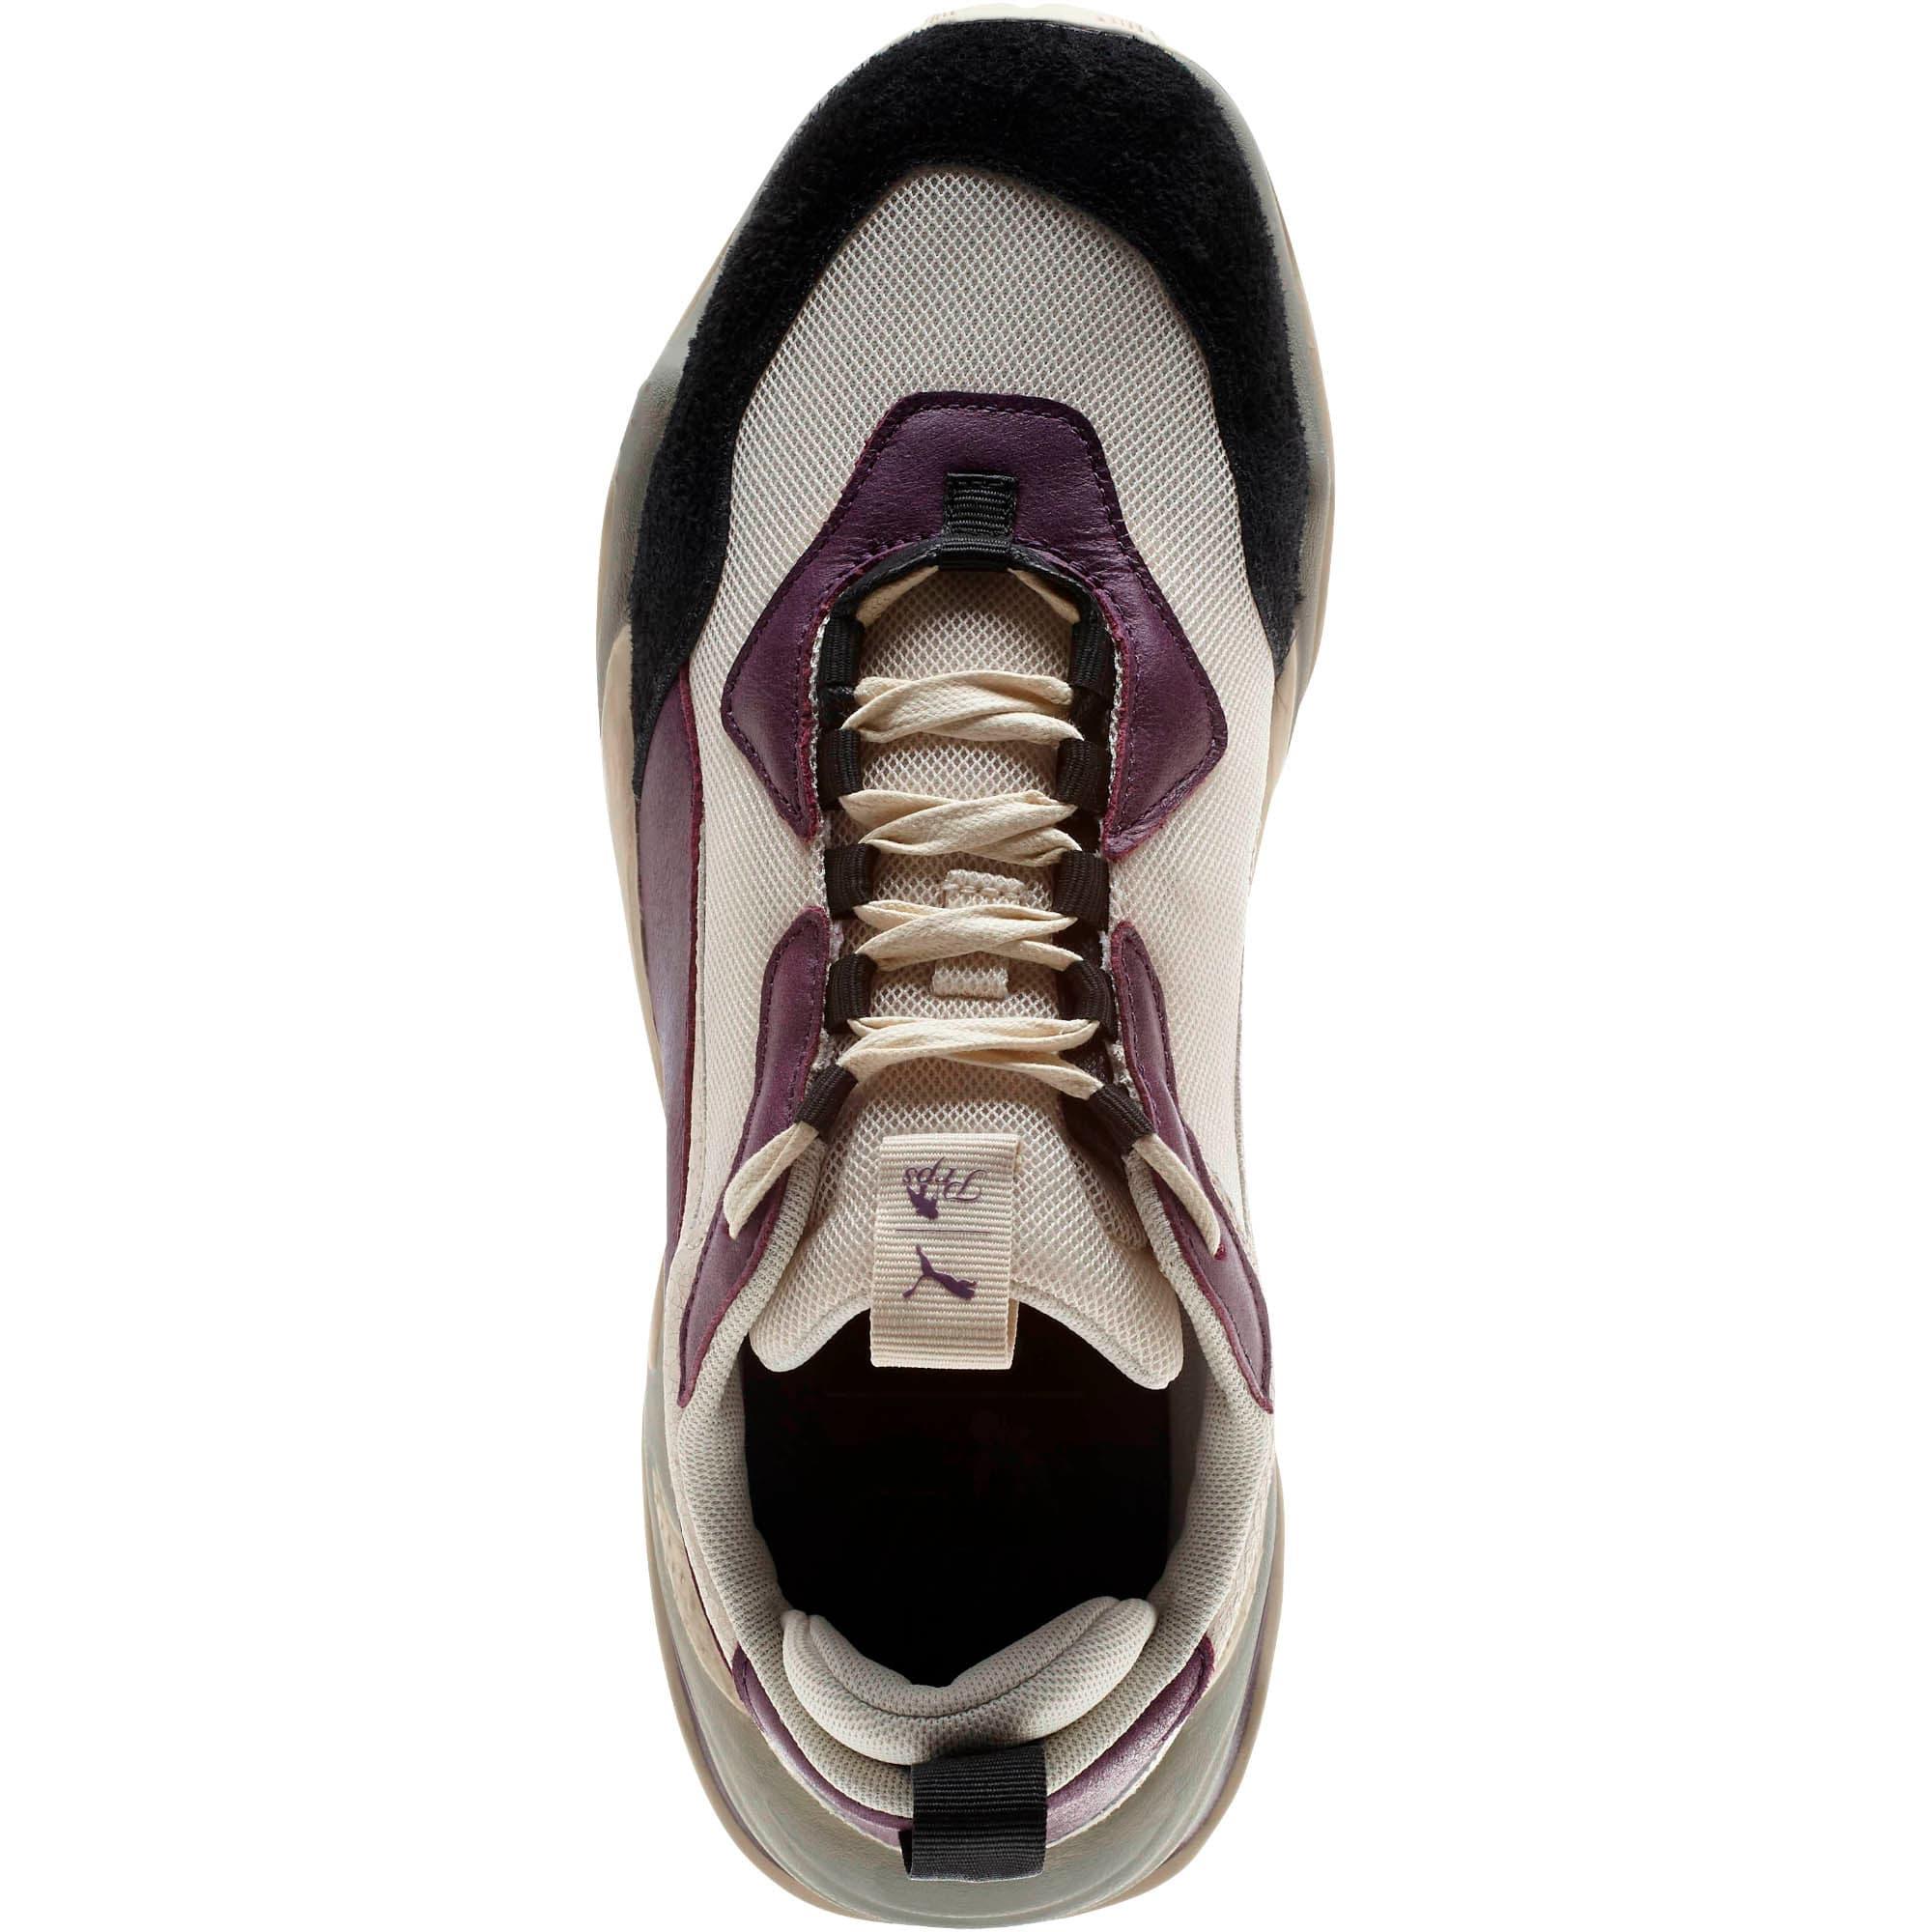 Thumbnail 5 of Thunder x PRPS Sneakers, Birch- Black-Indigo, medium